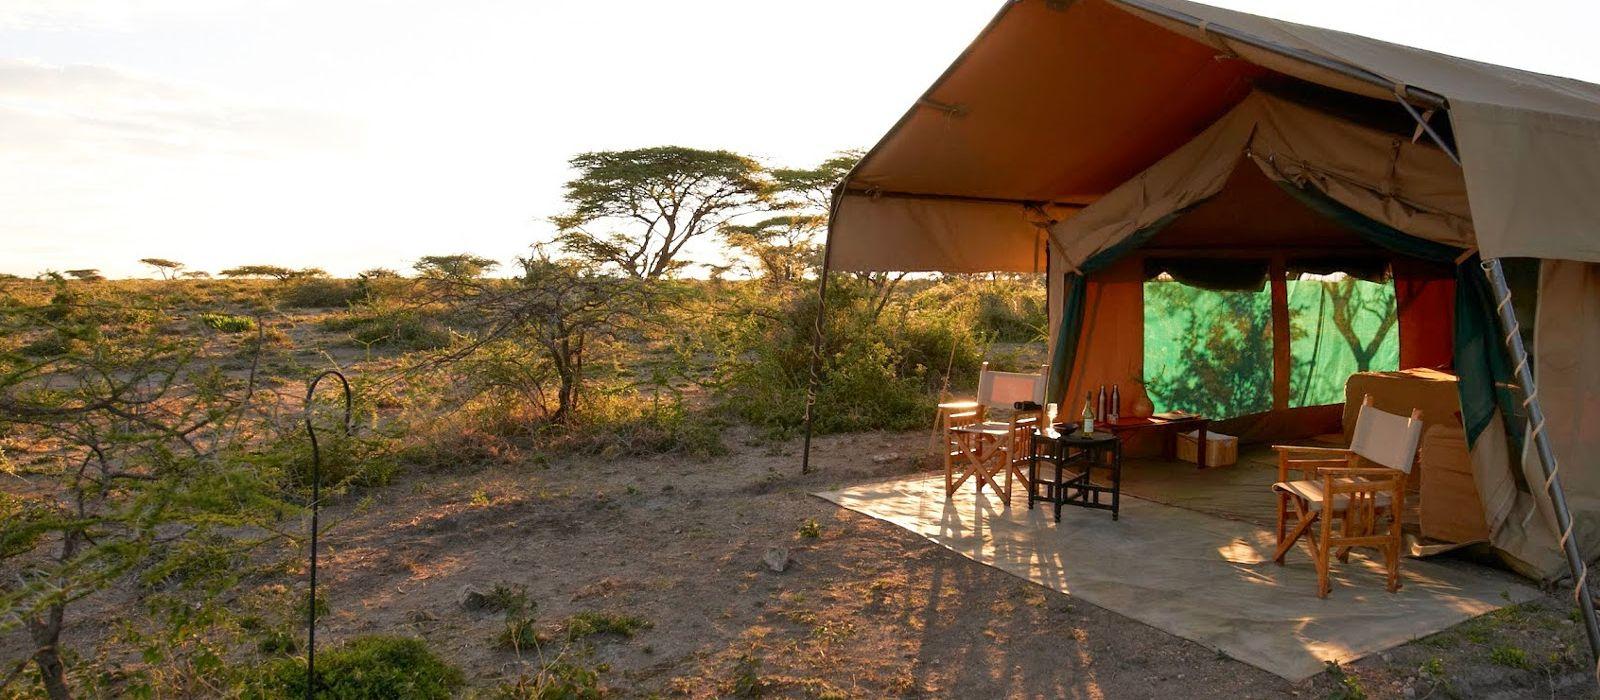 Hotel Ubuntu Camp S Tanzania